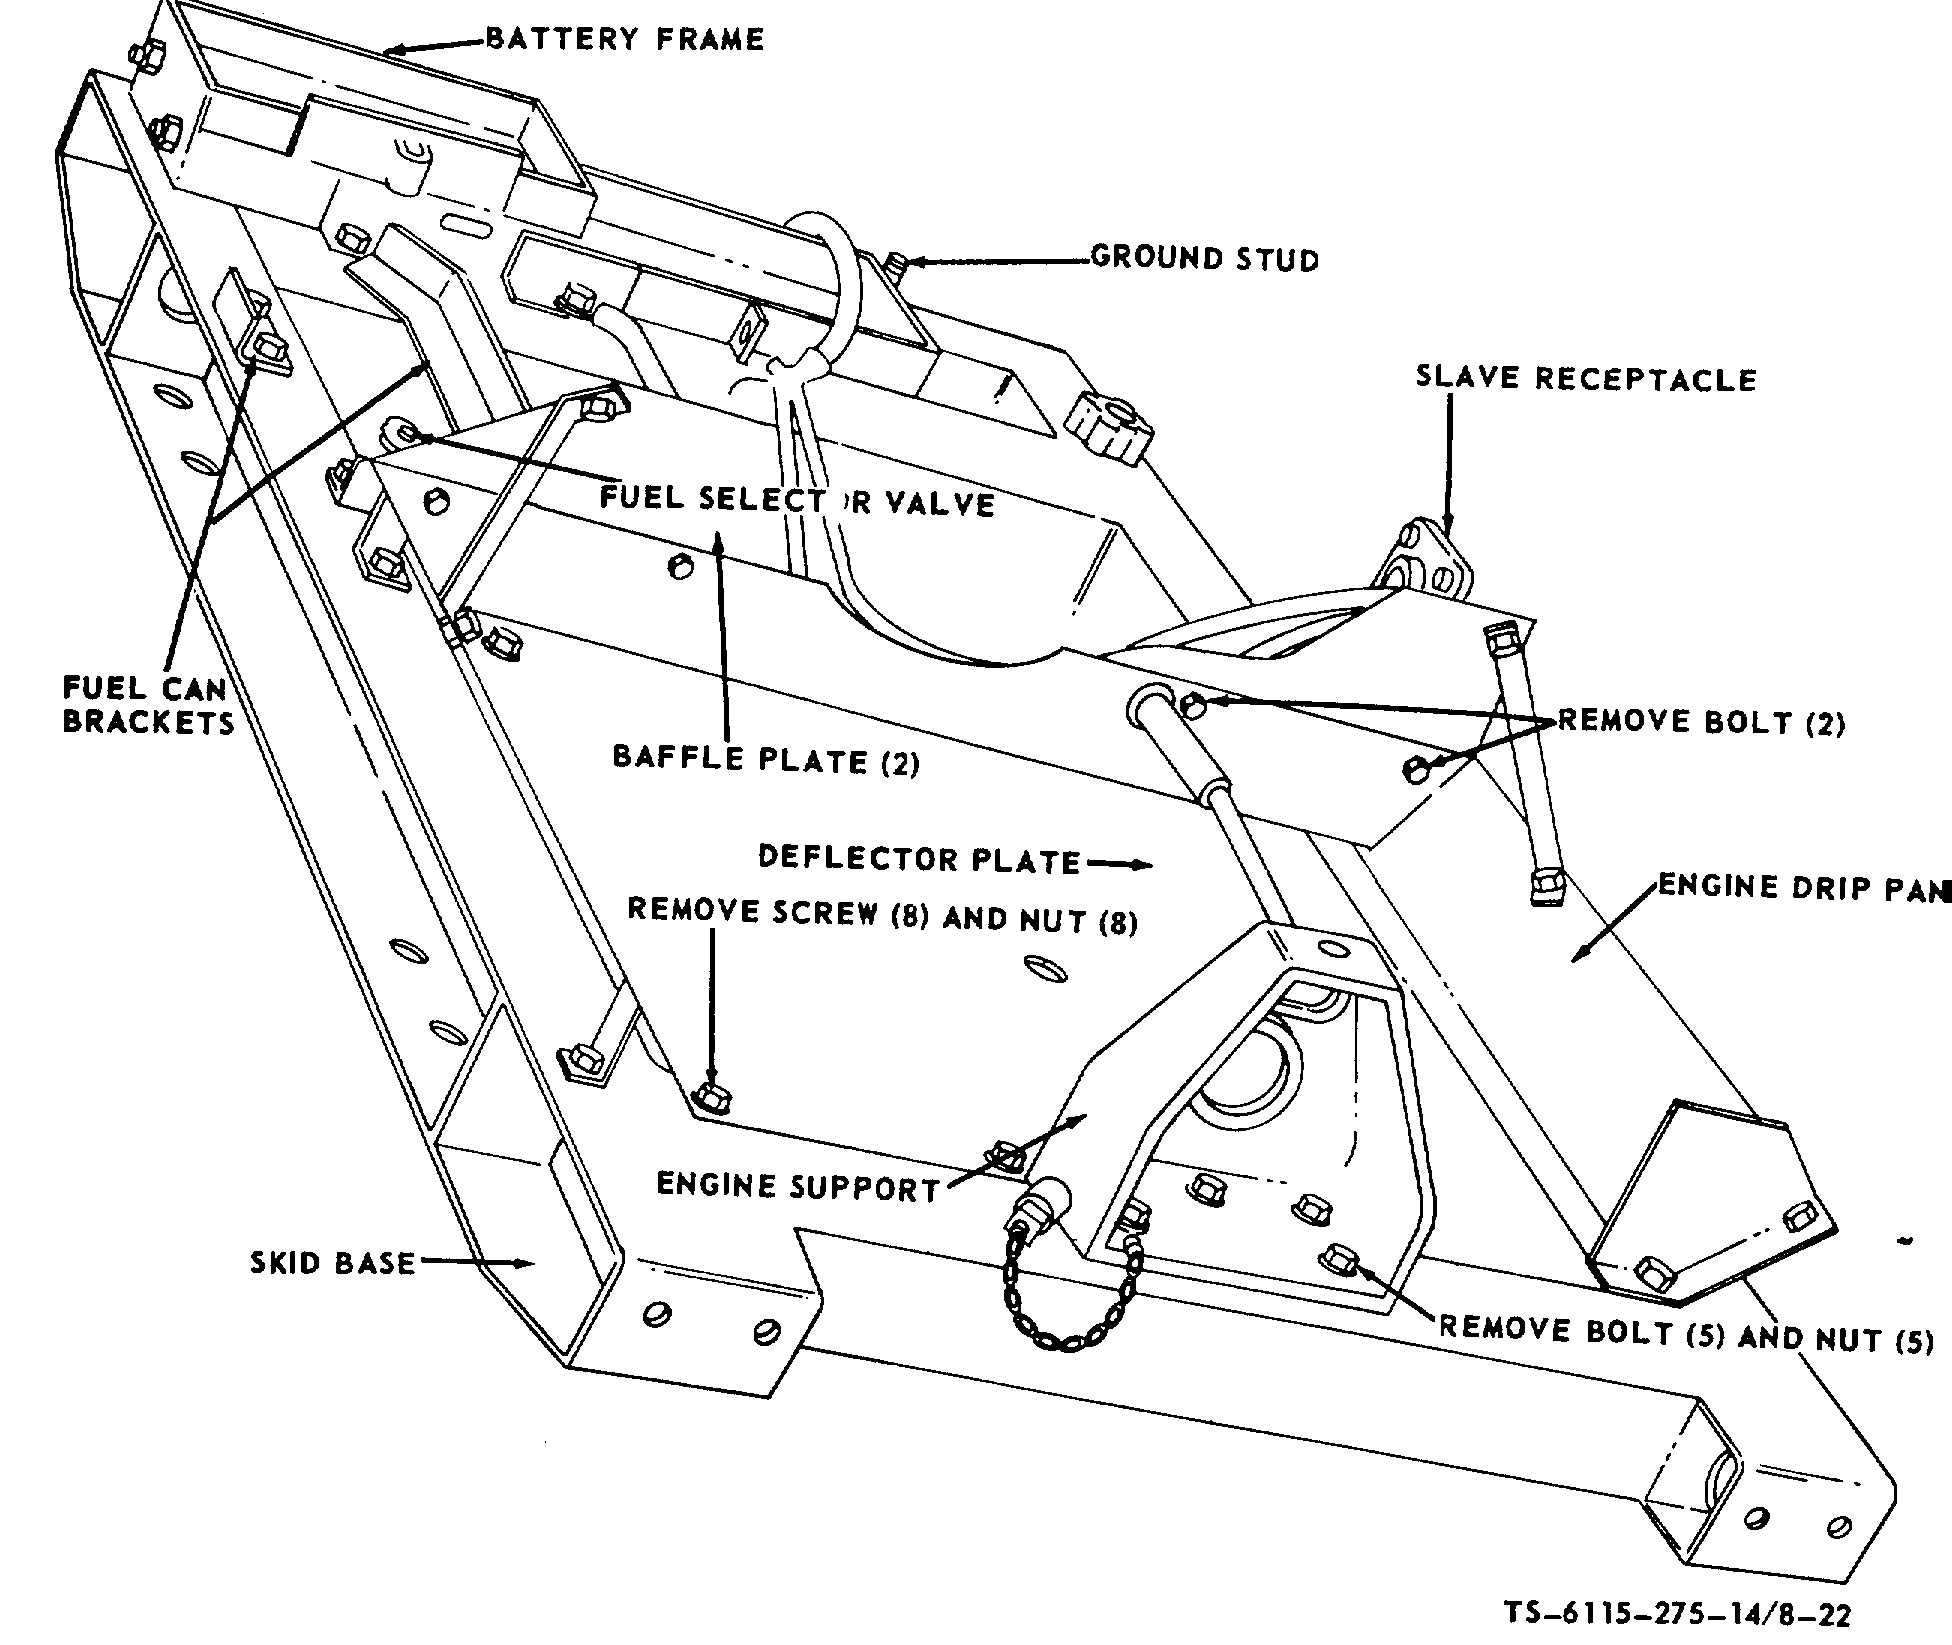 drain pan base plate